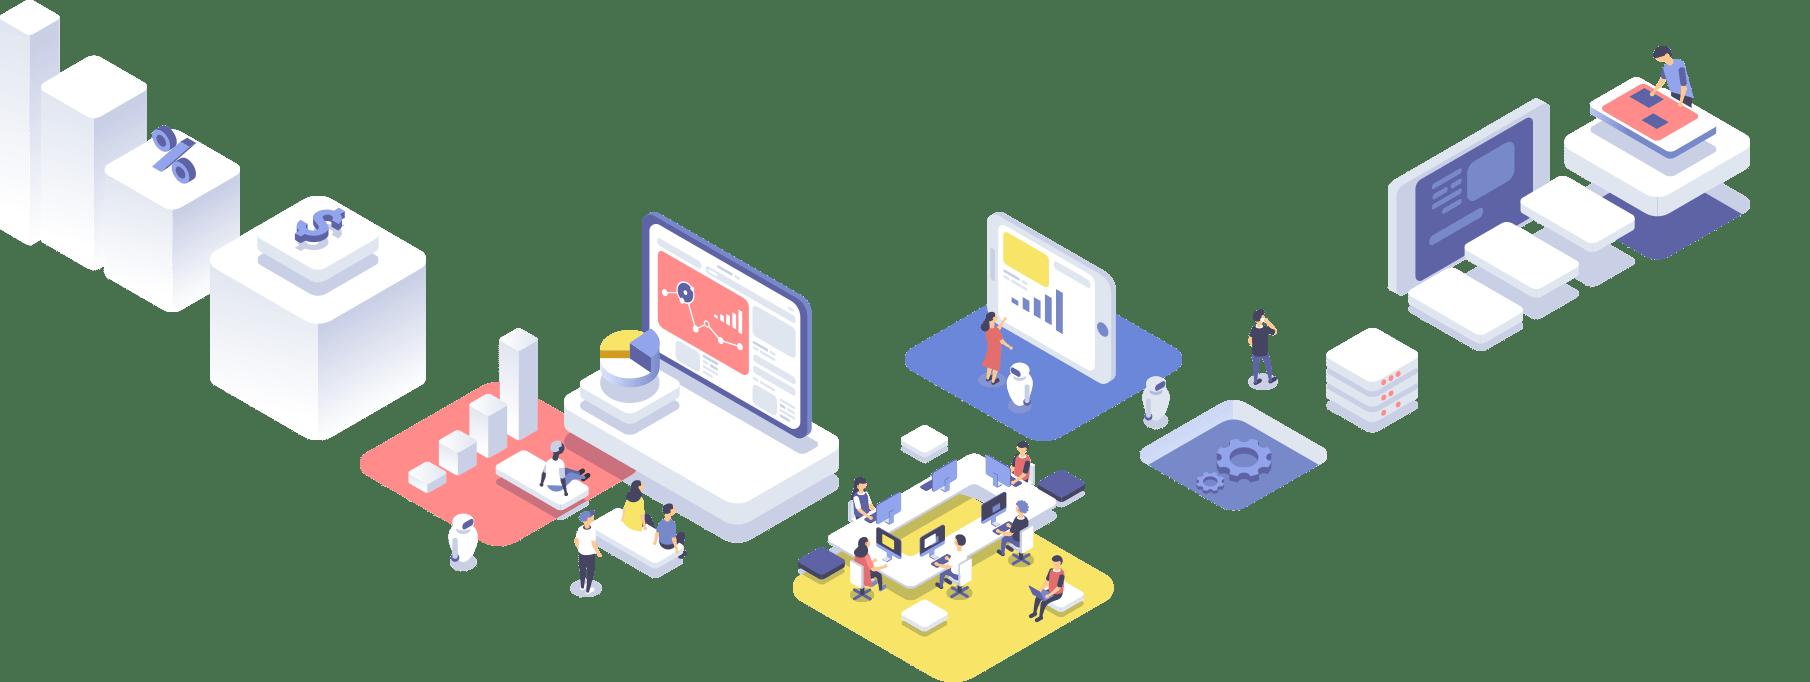 startup-03-image-01-min